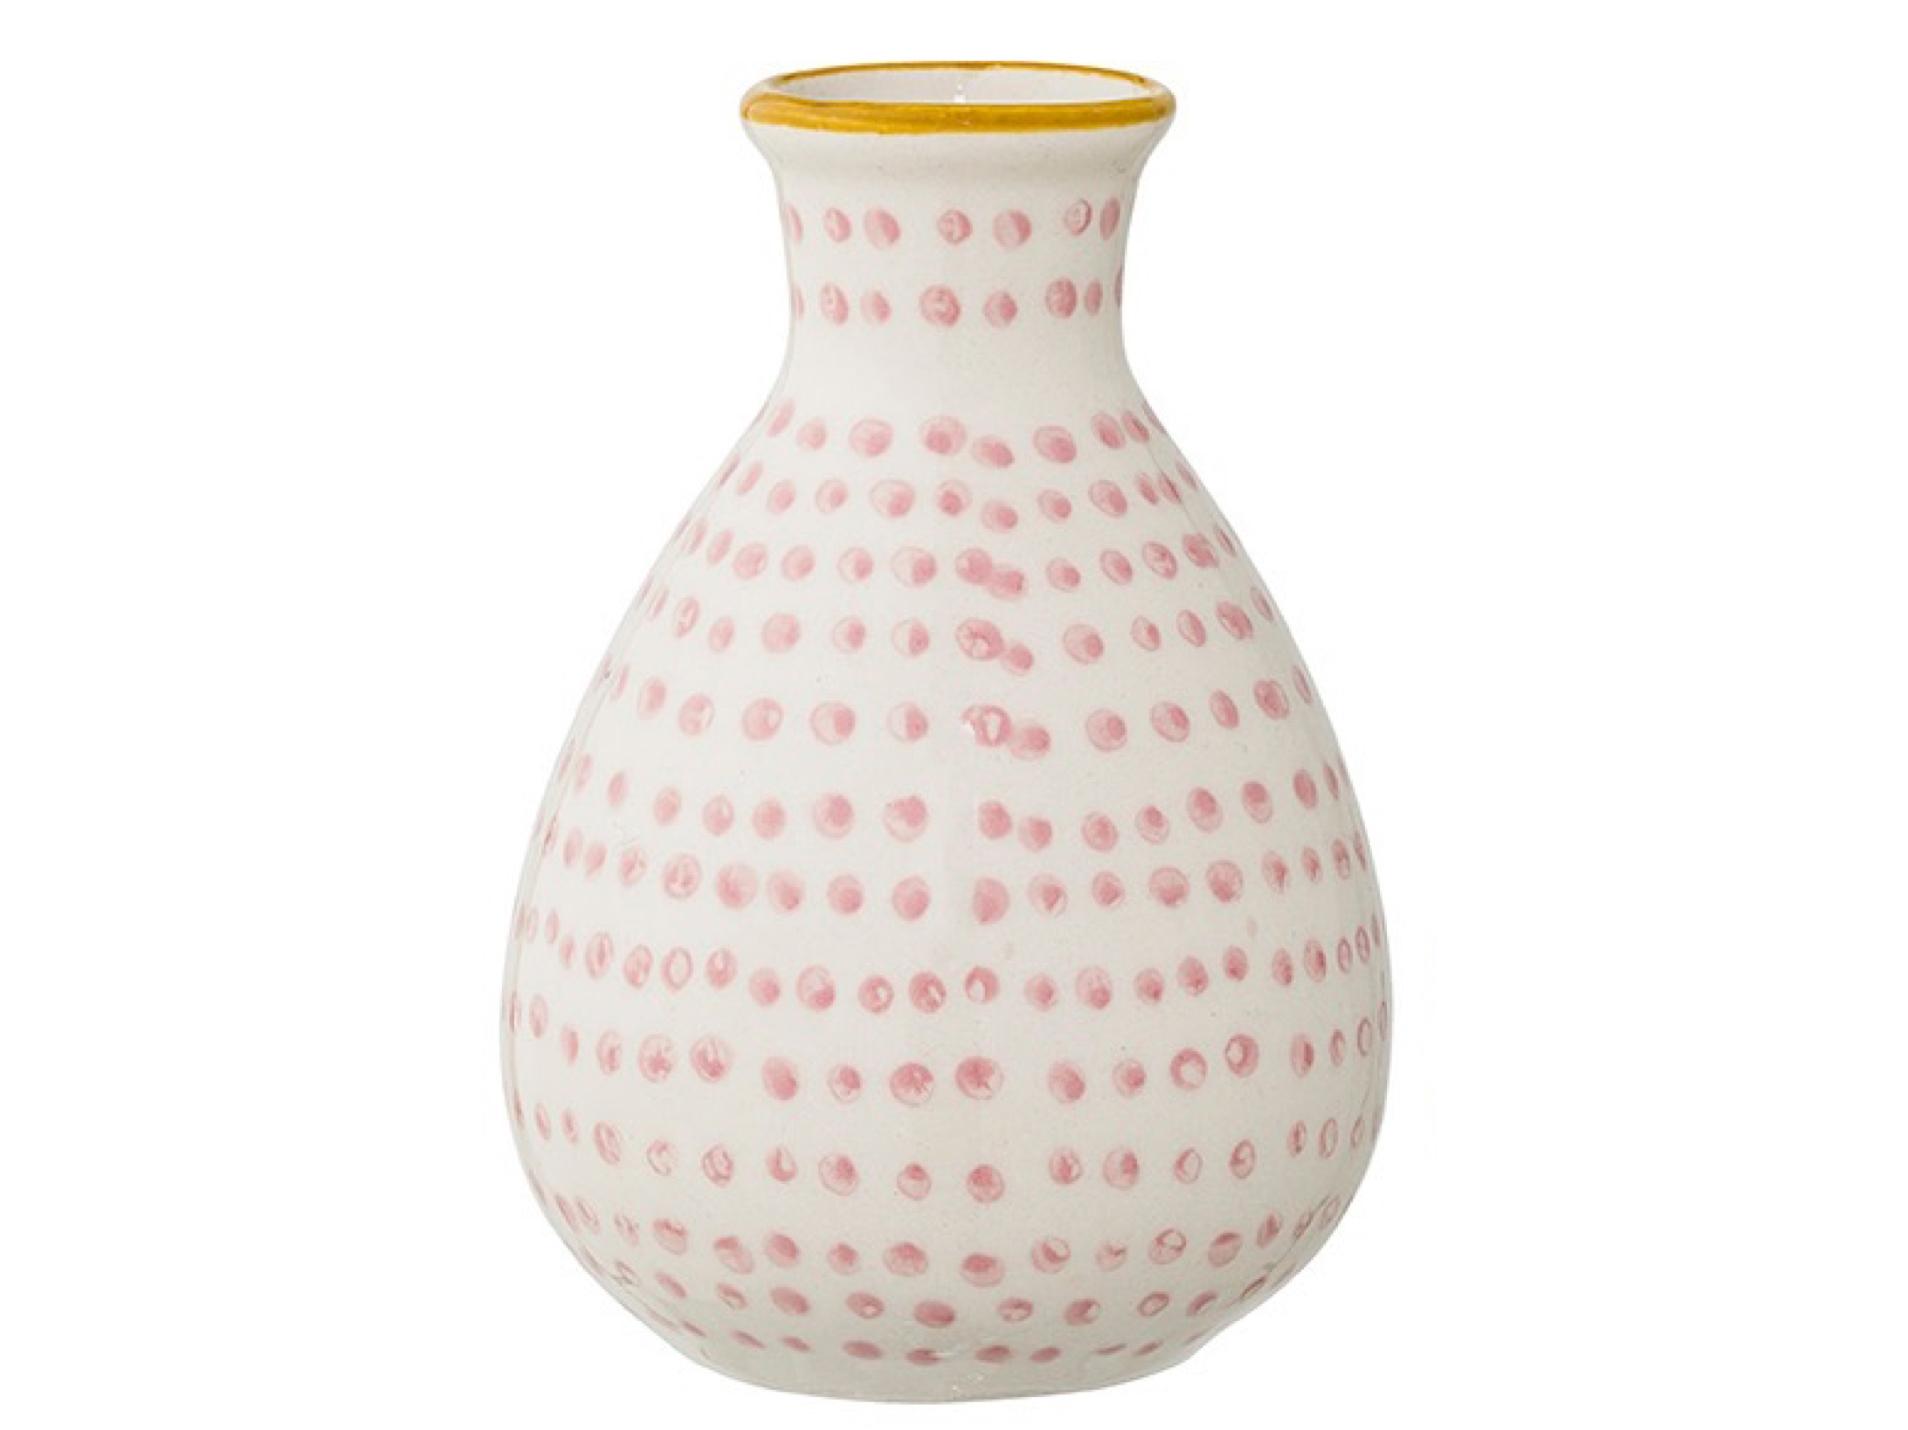 Декоративная ваза Bloomingville 15438237 от thefurnish